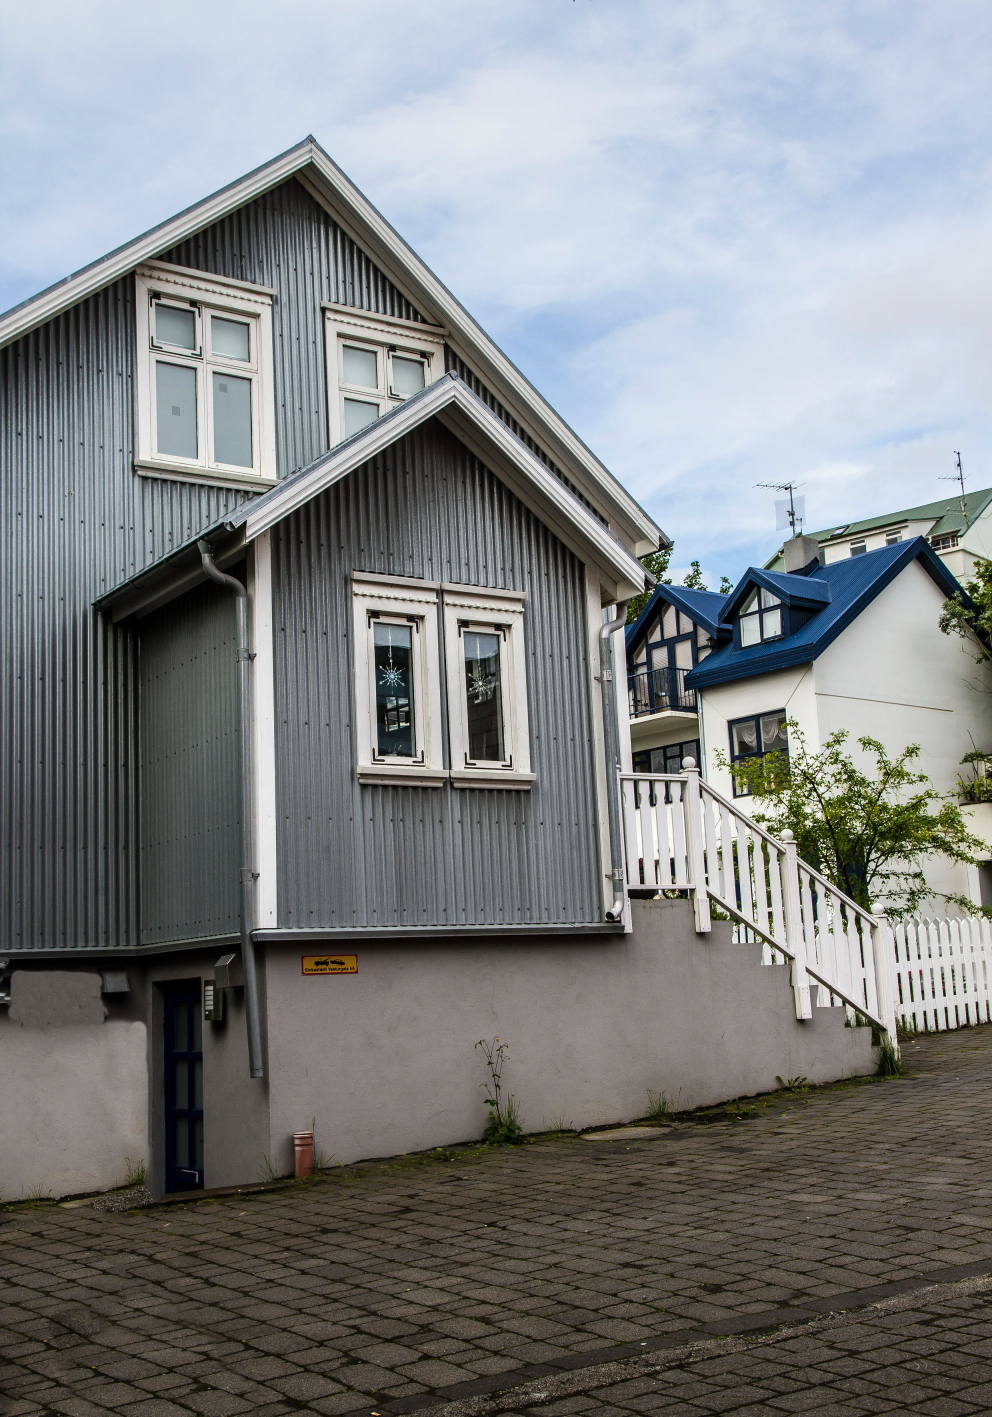 Iceland -House in Reykjavik